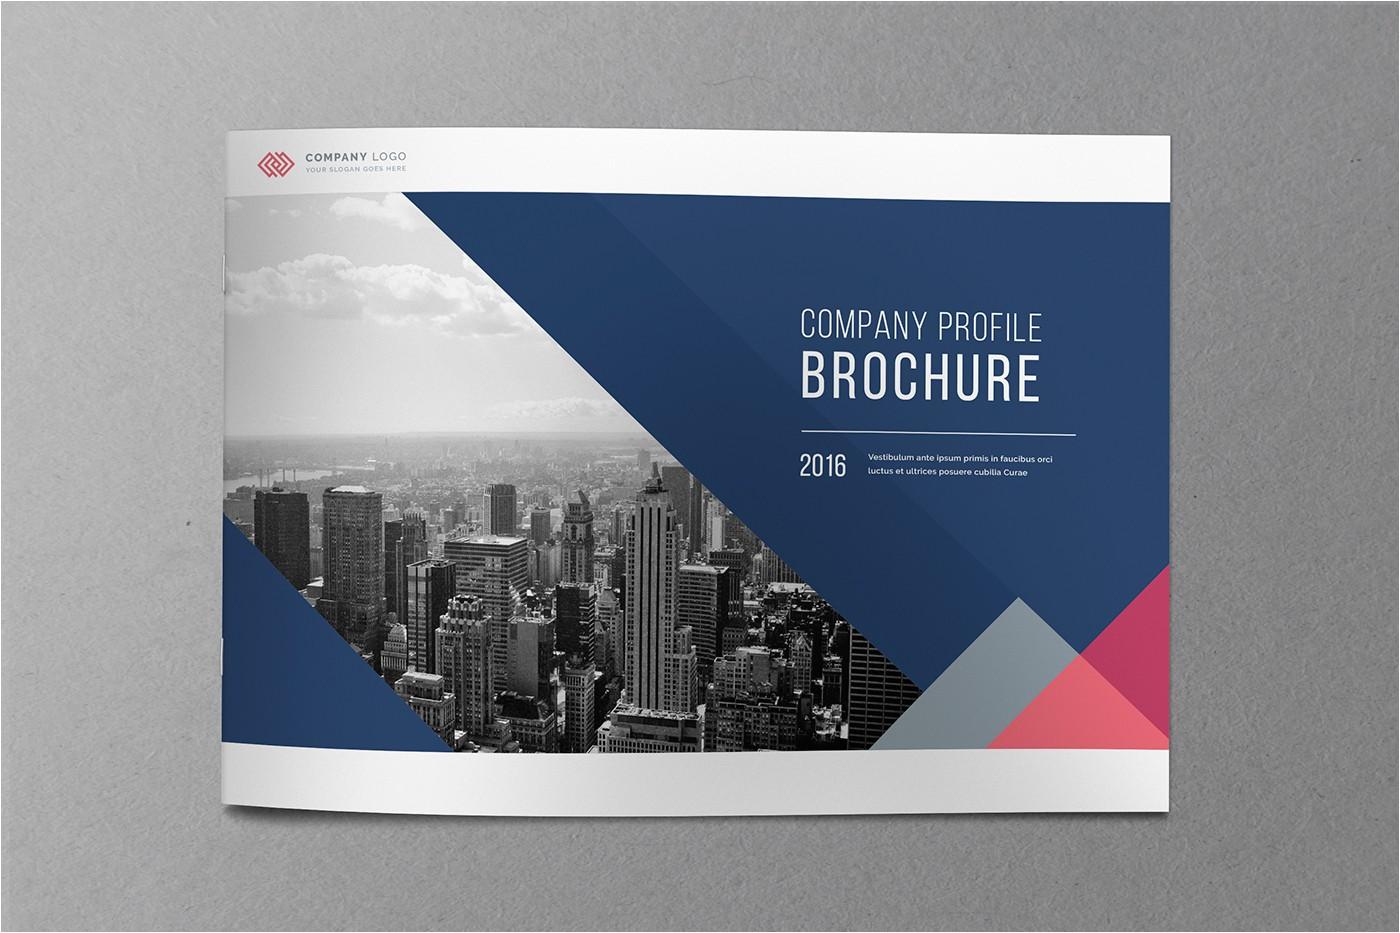 Brochure Templates for It Company 20 Financial Brochures Psd Vector Eps Jpg Download